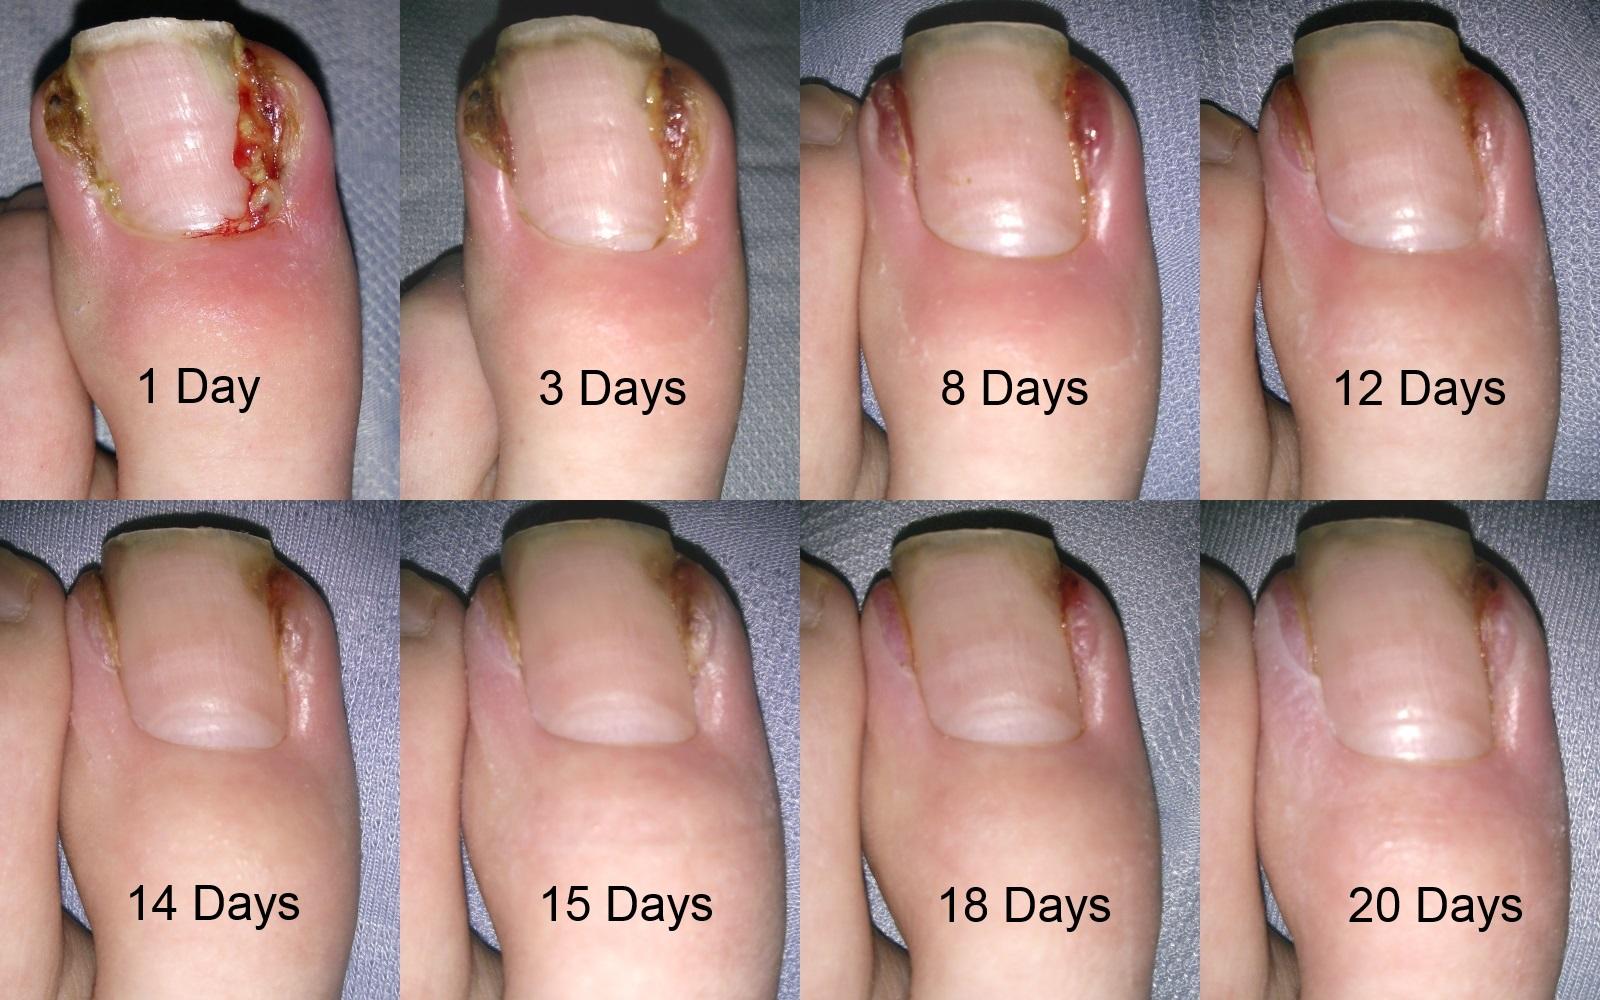 Infected Ingrowing Toe...